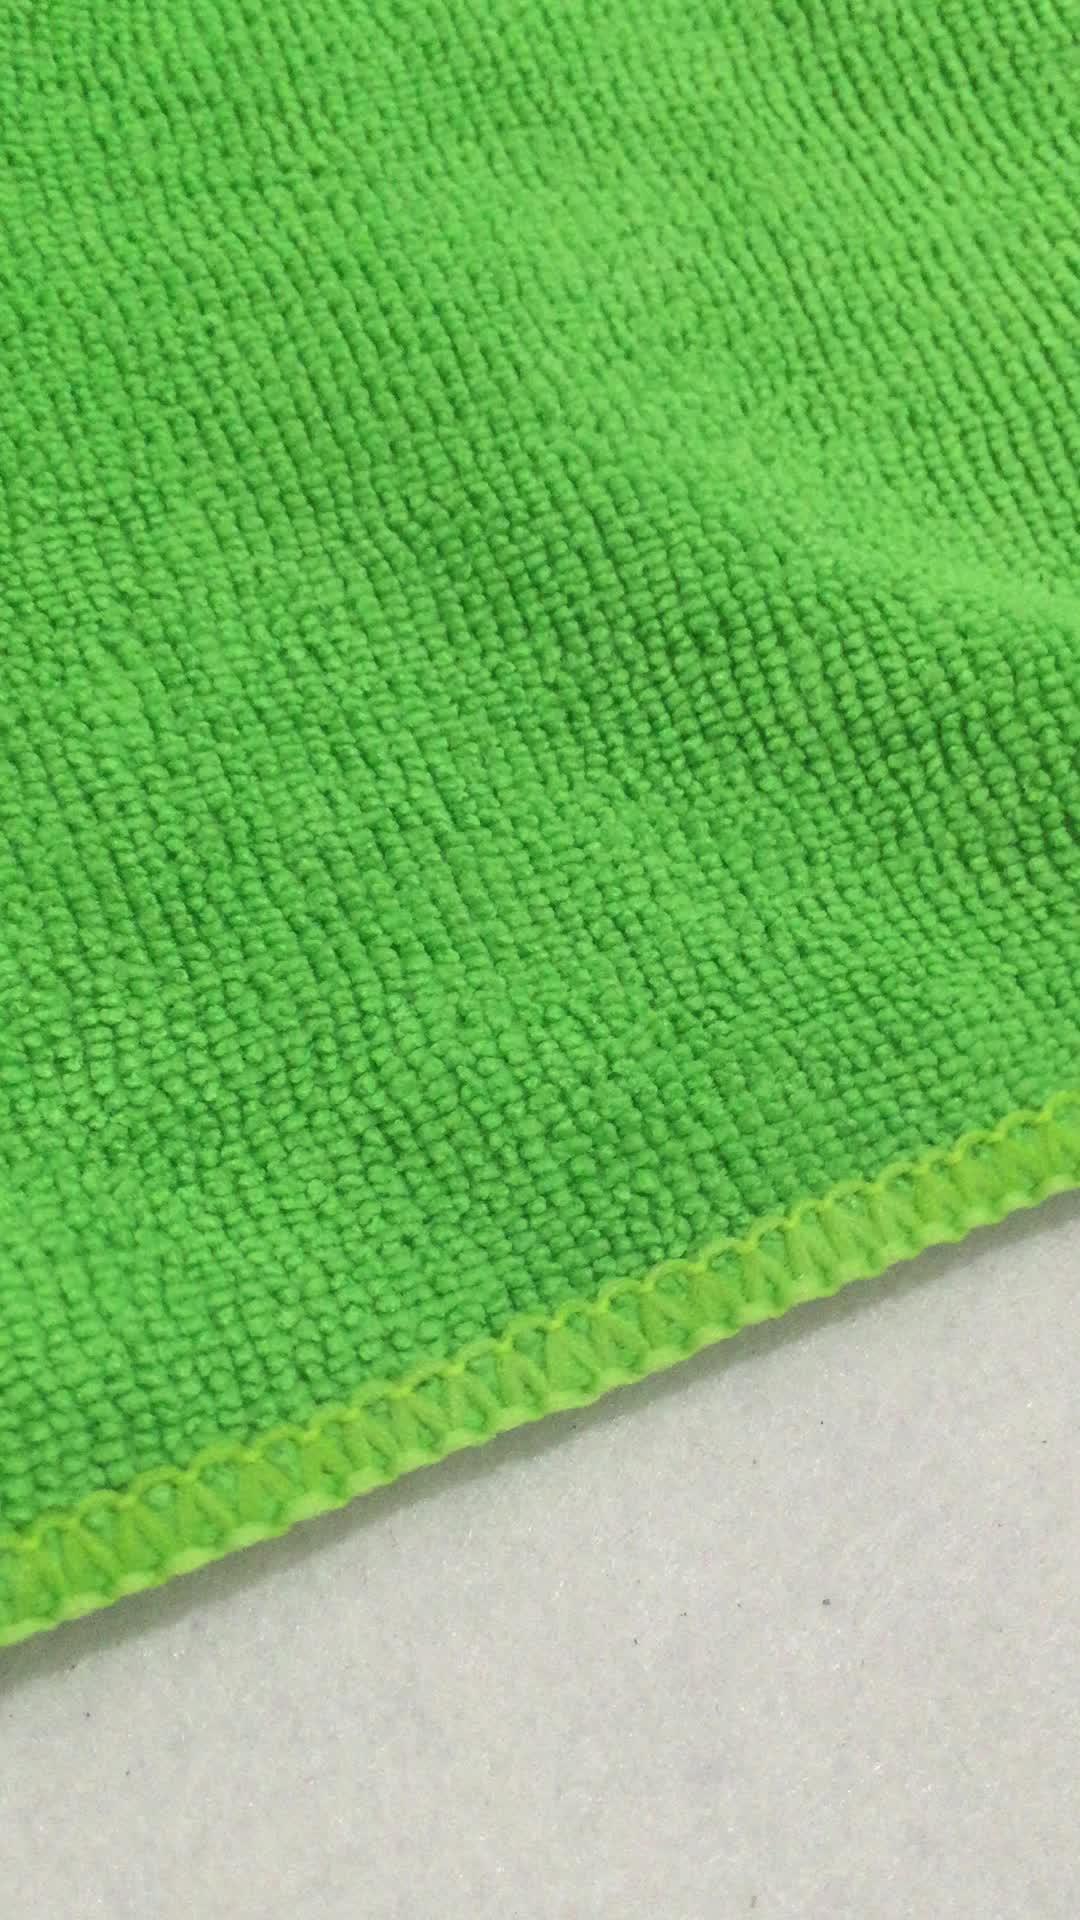 Toalha microfibra làm sạch vải sợi nhỏ cho xe